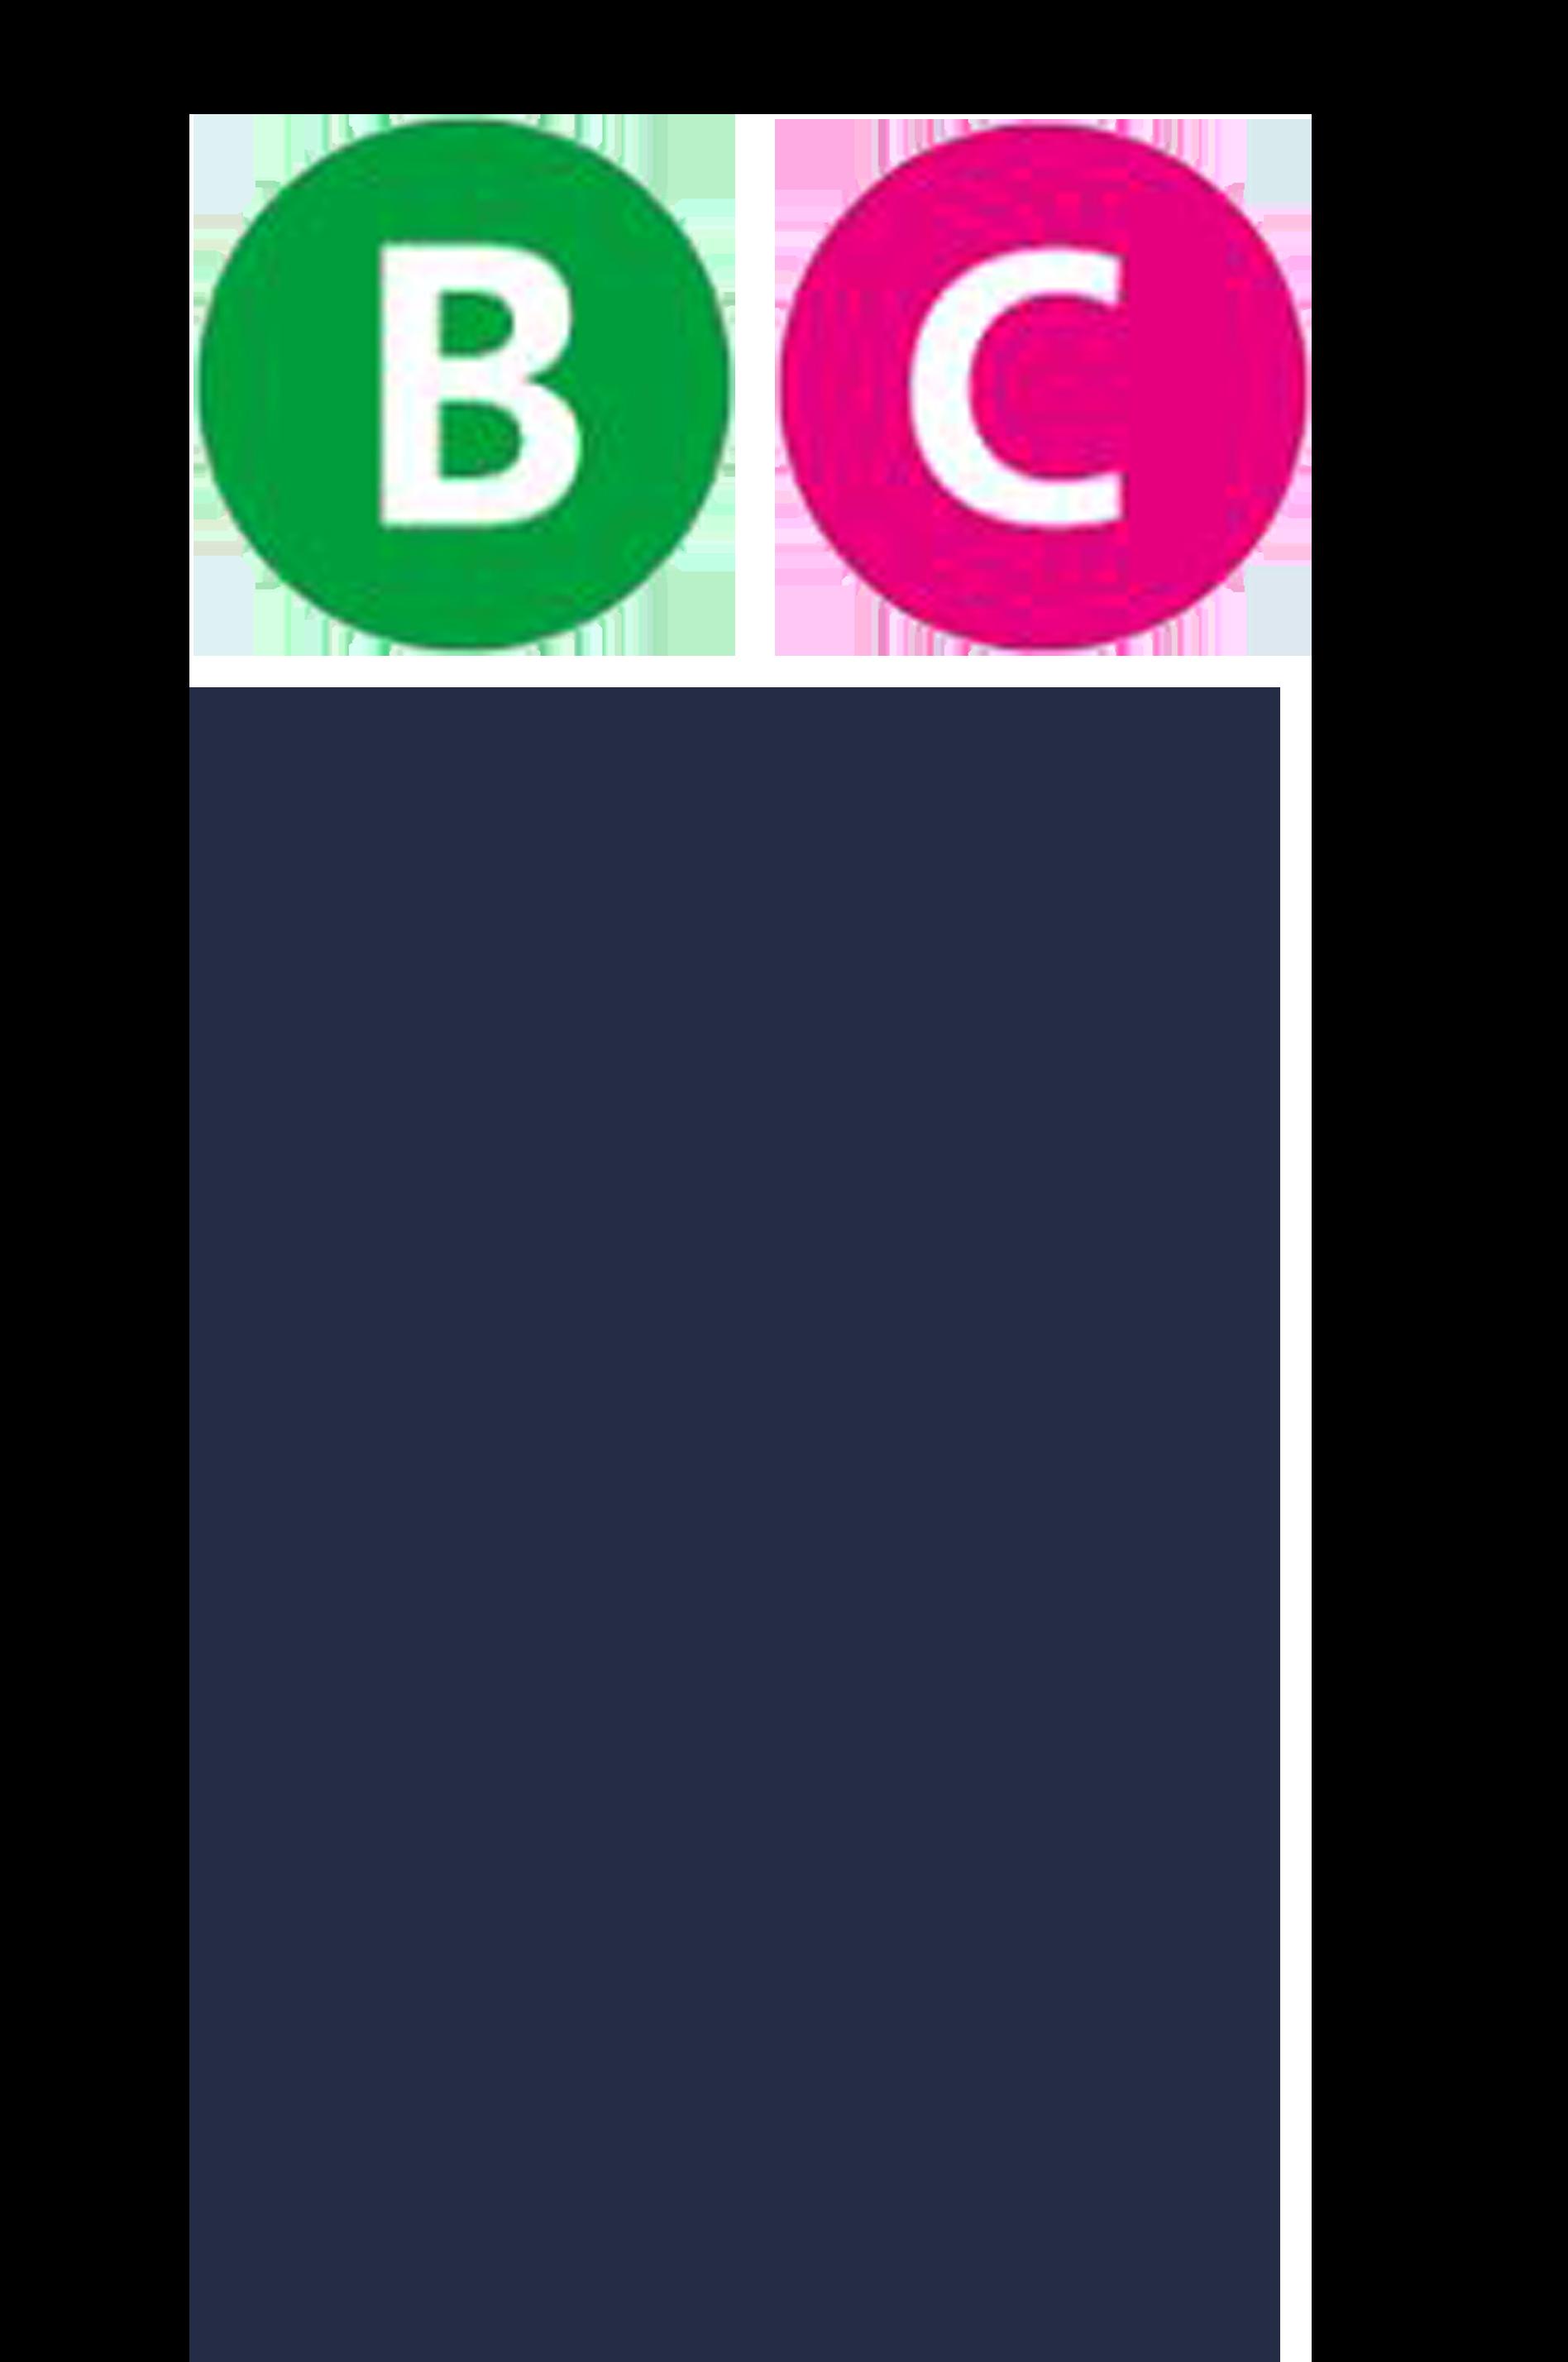 tram b